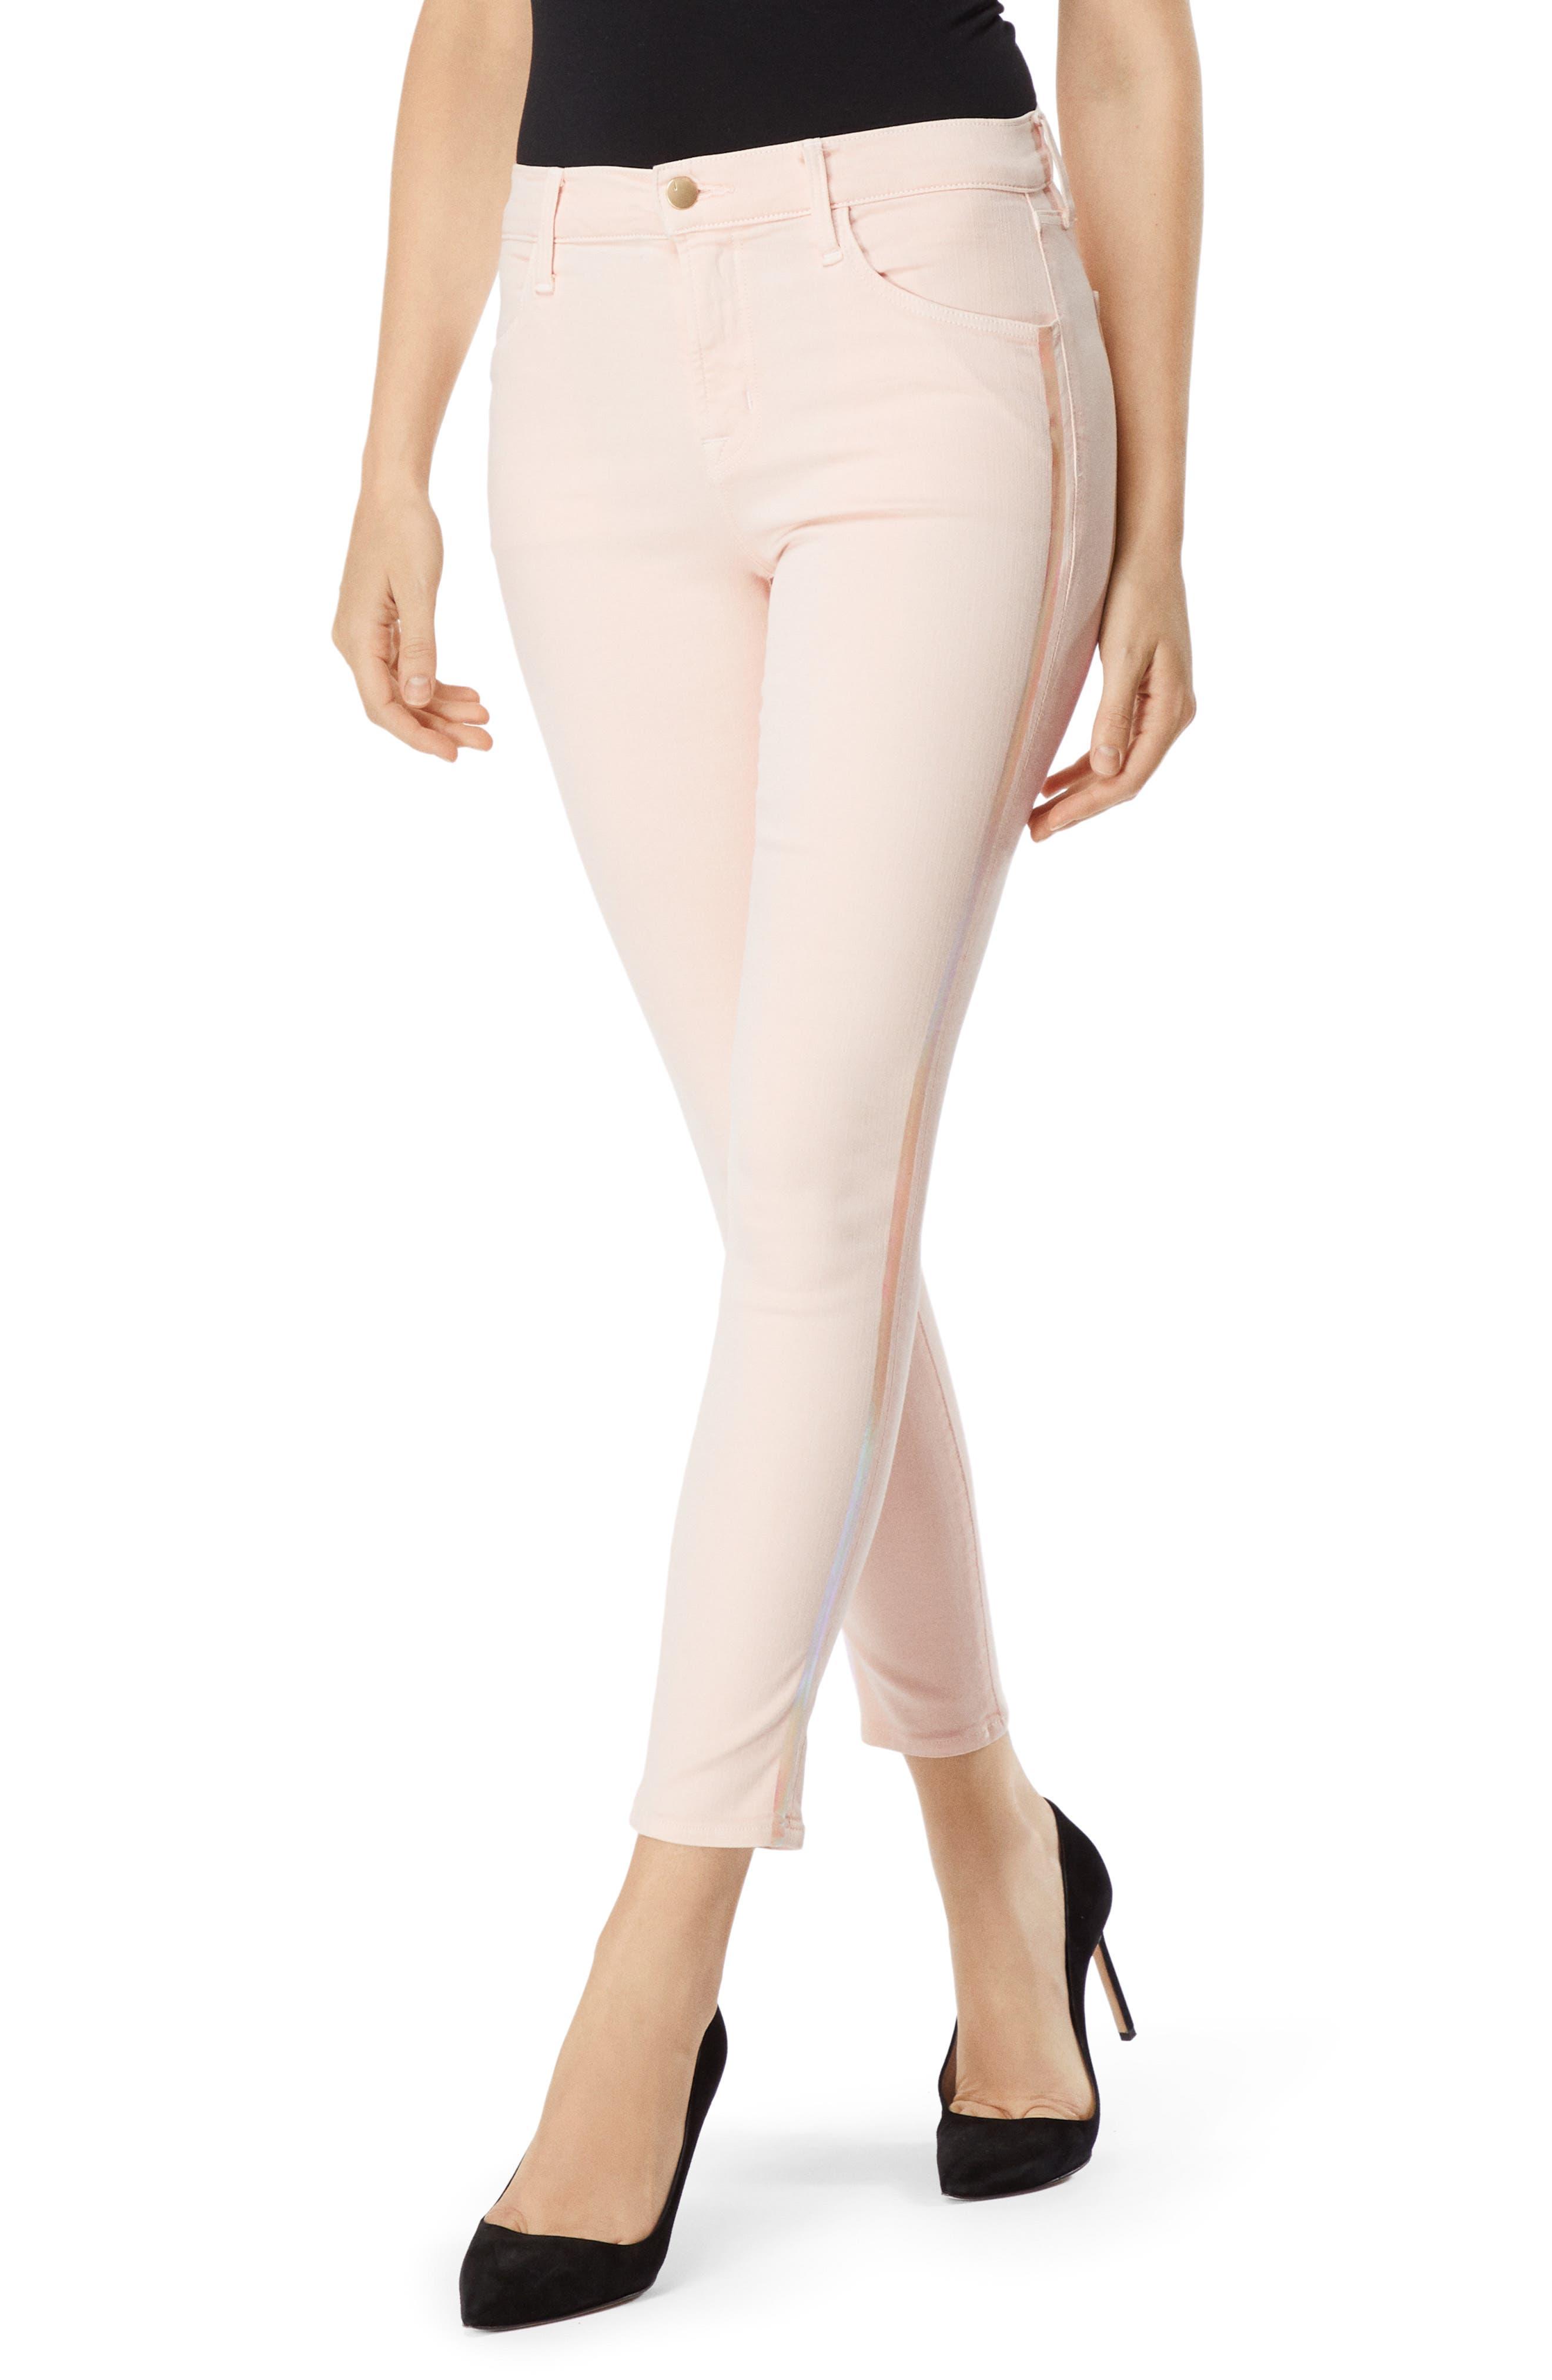 J BRAND, Alana High Waist Ankle Skinny Jeans, Main thumbnail 1, color, 684